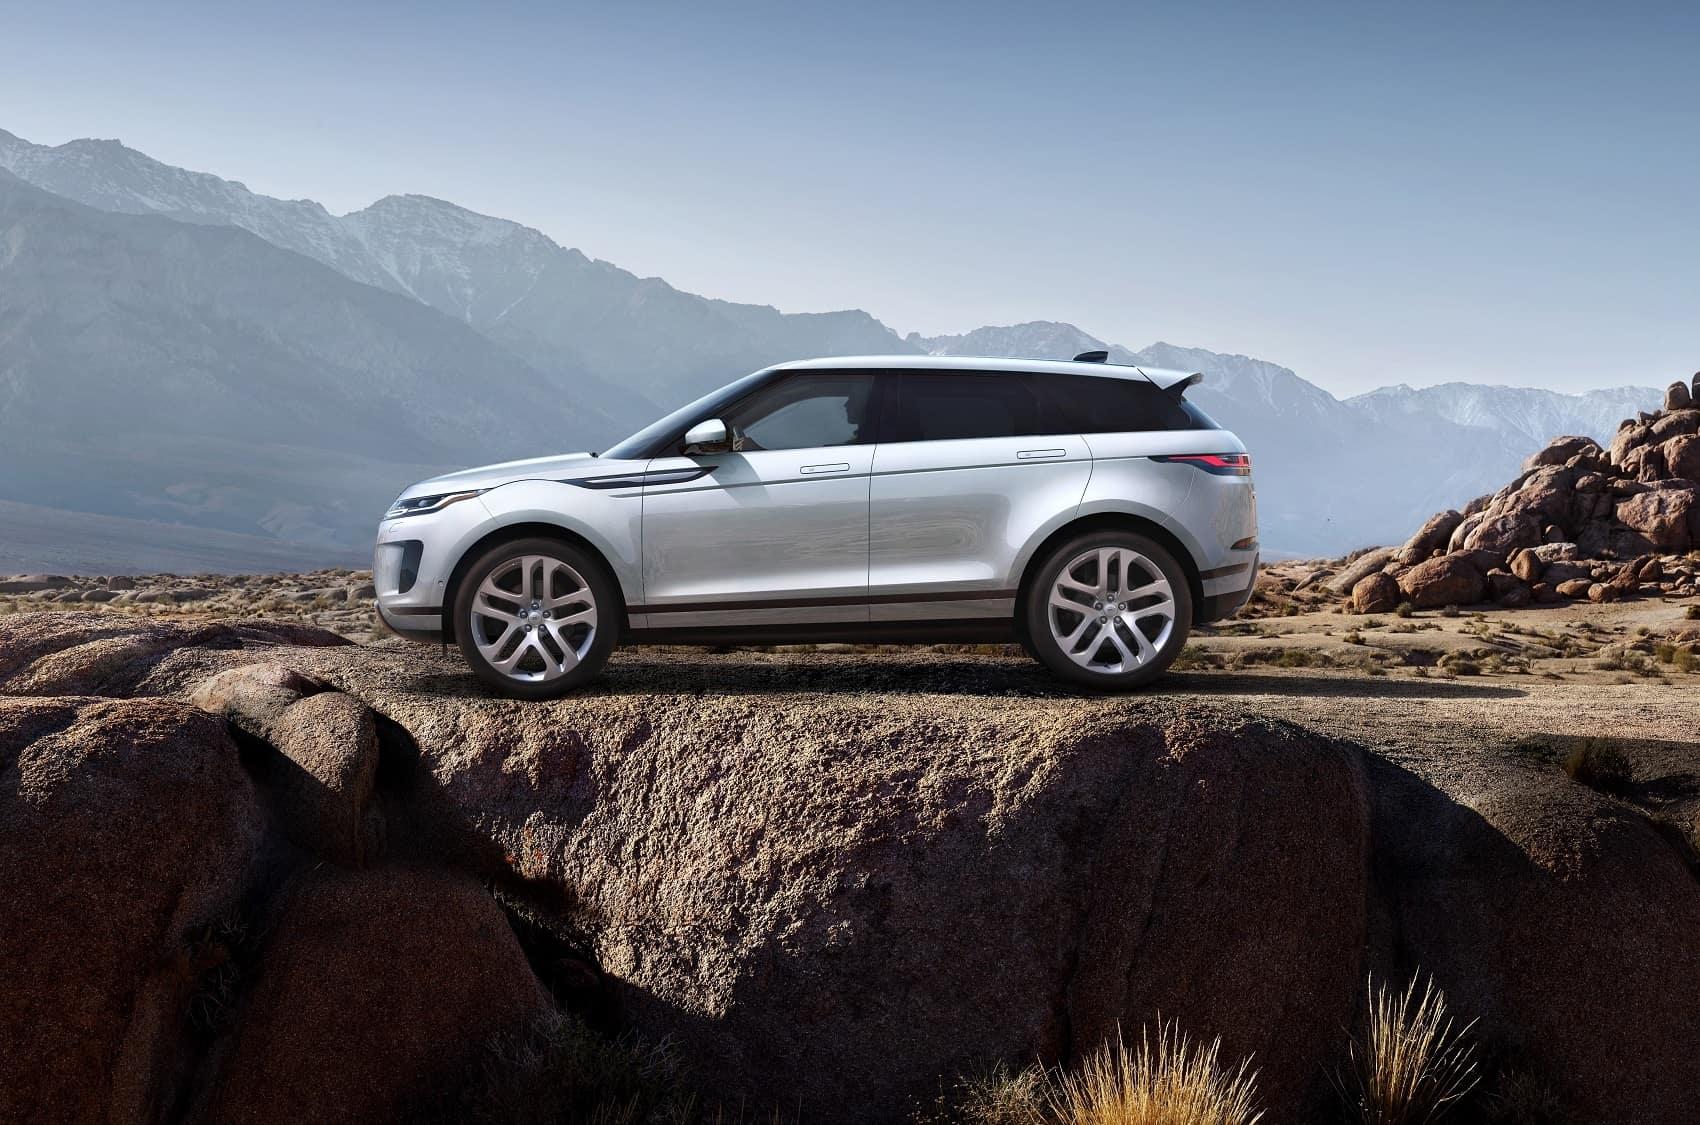 2020 Range Rover Evoque Off-Road